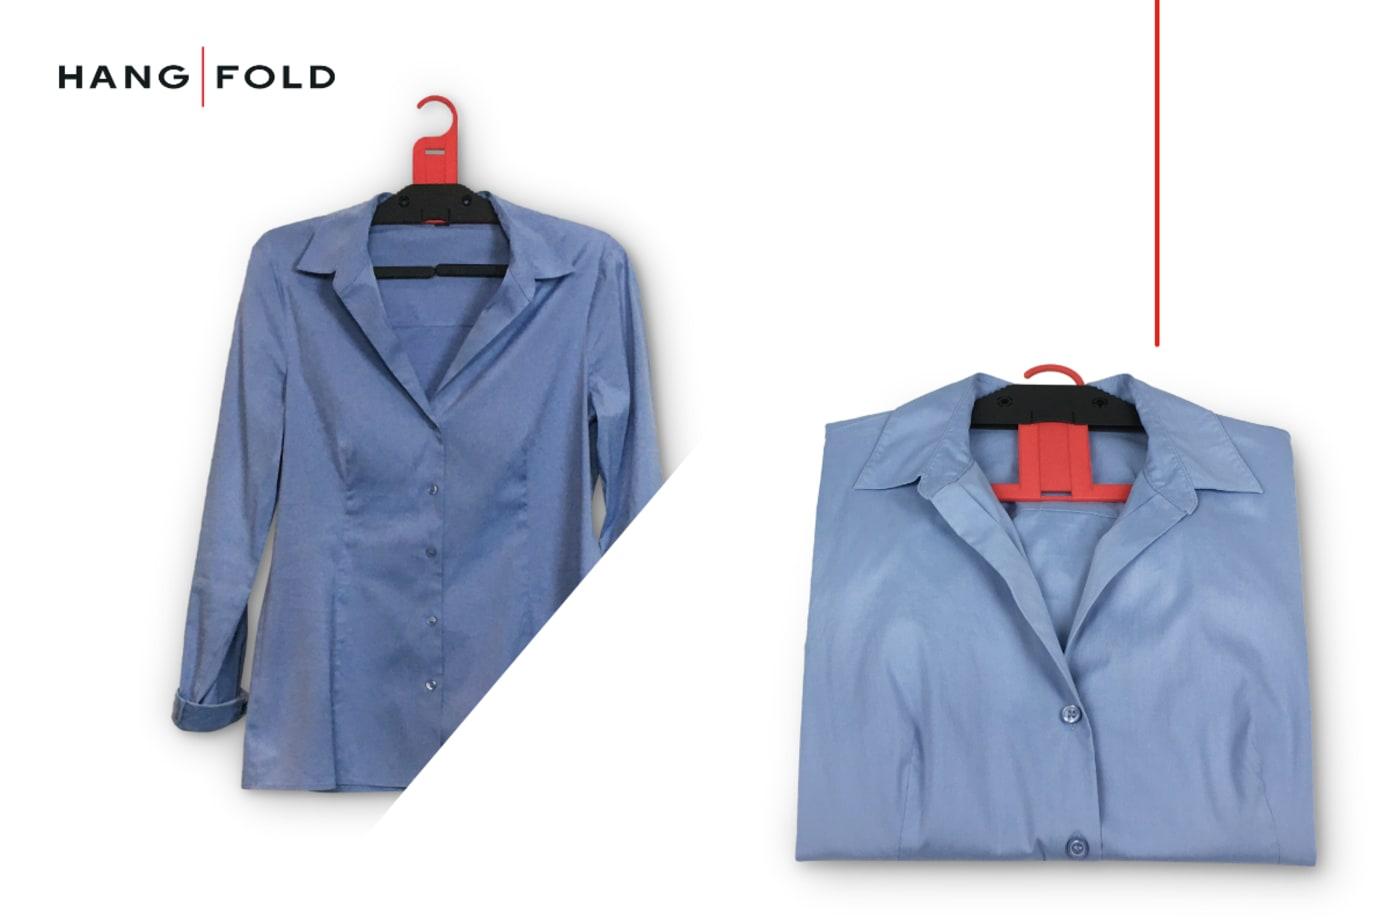 HangFold - Your Travel Partner (plastic clothes hangers)